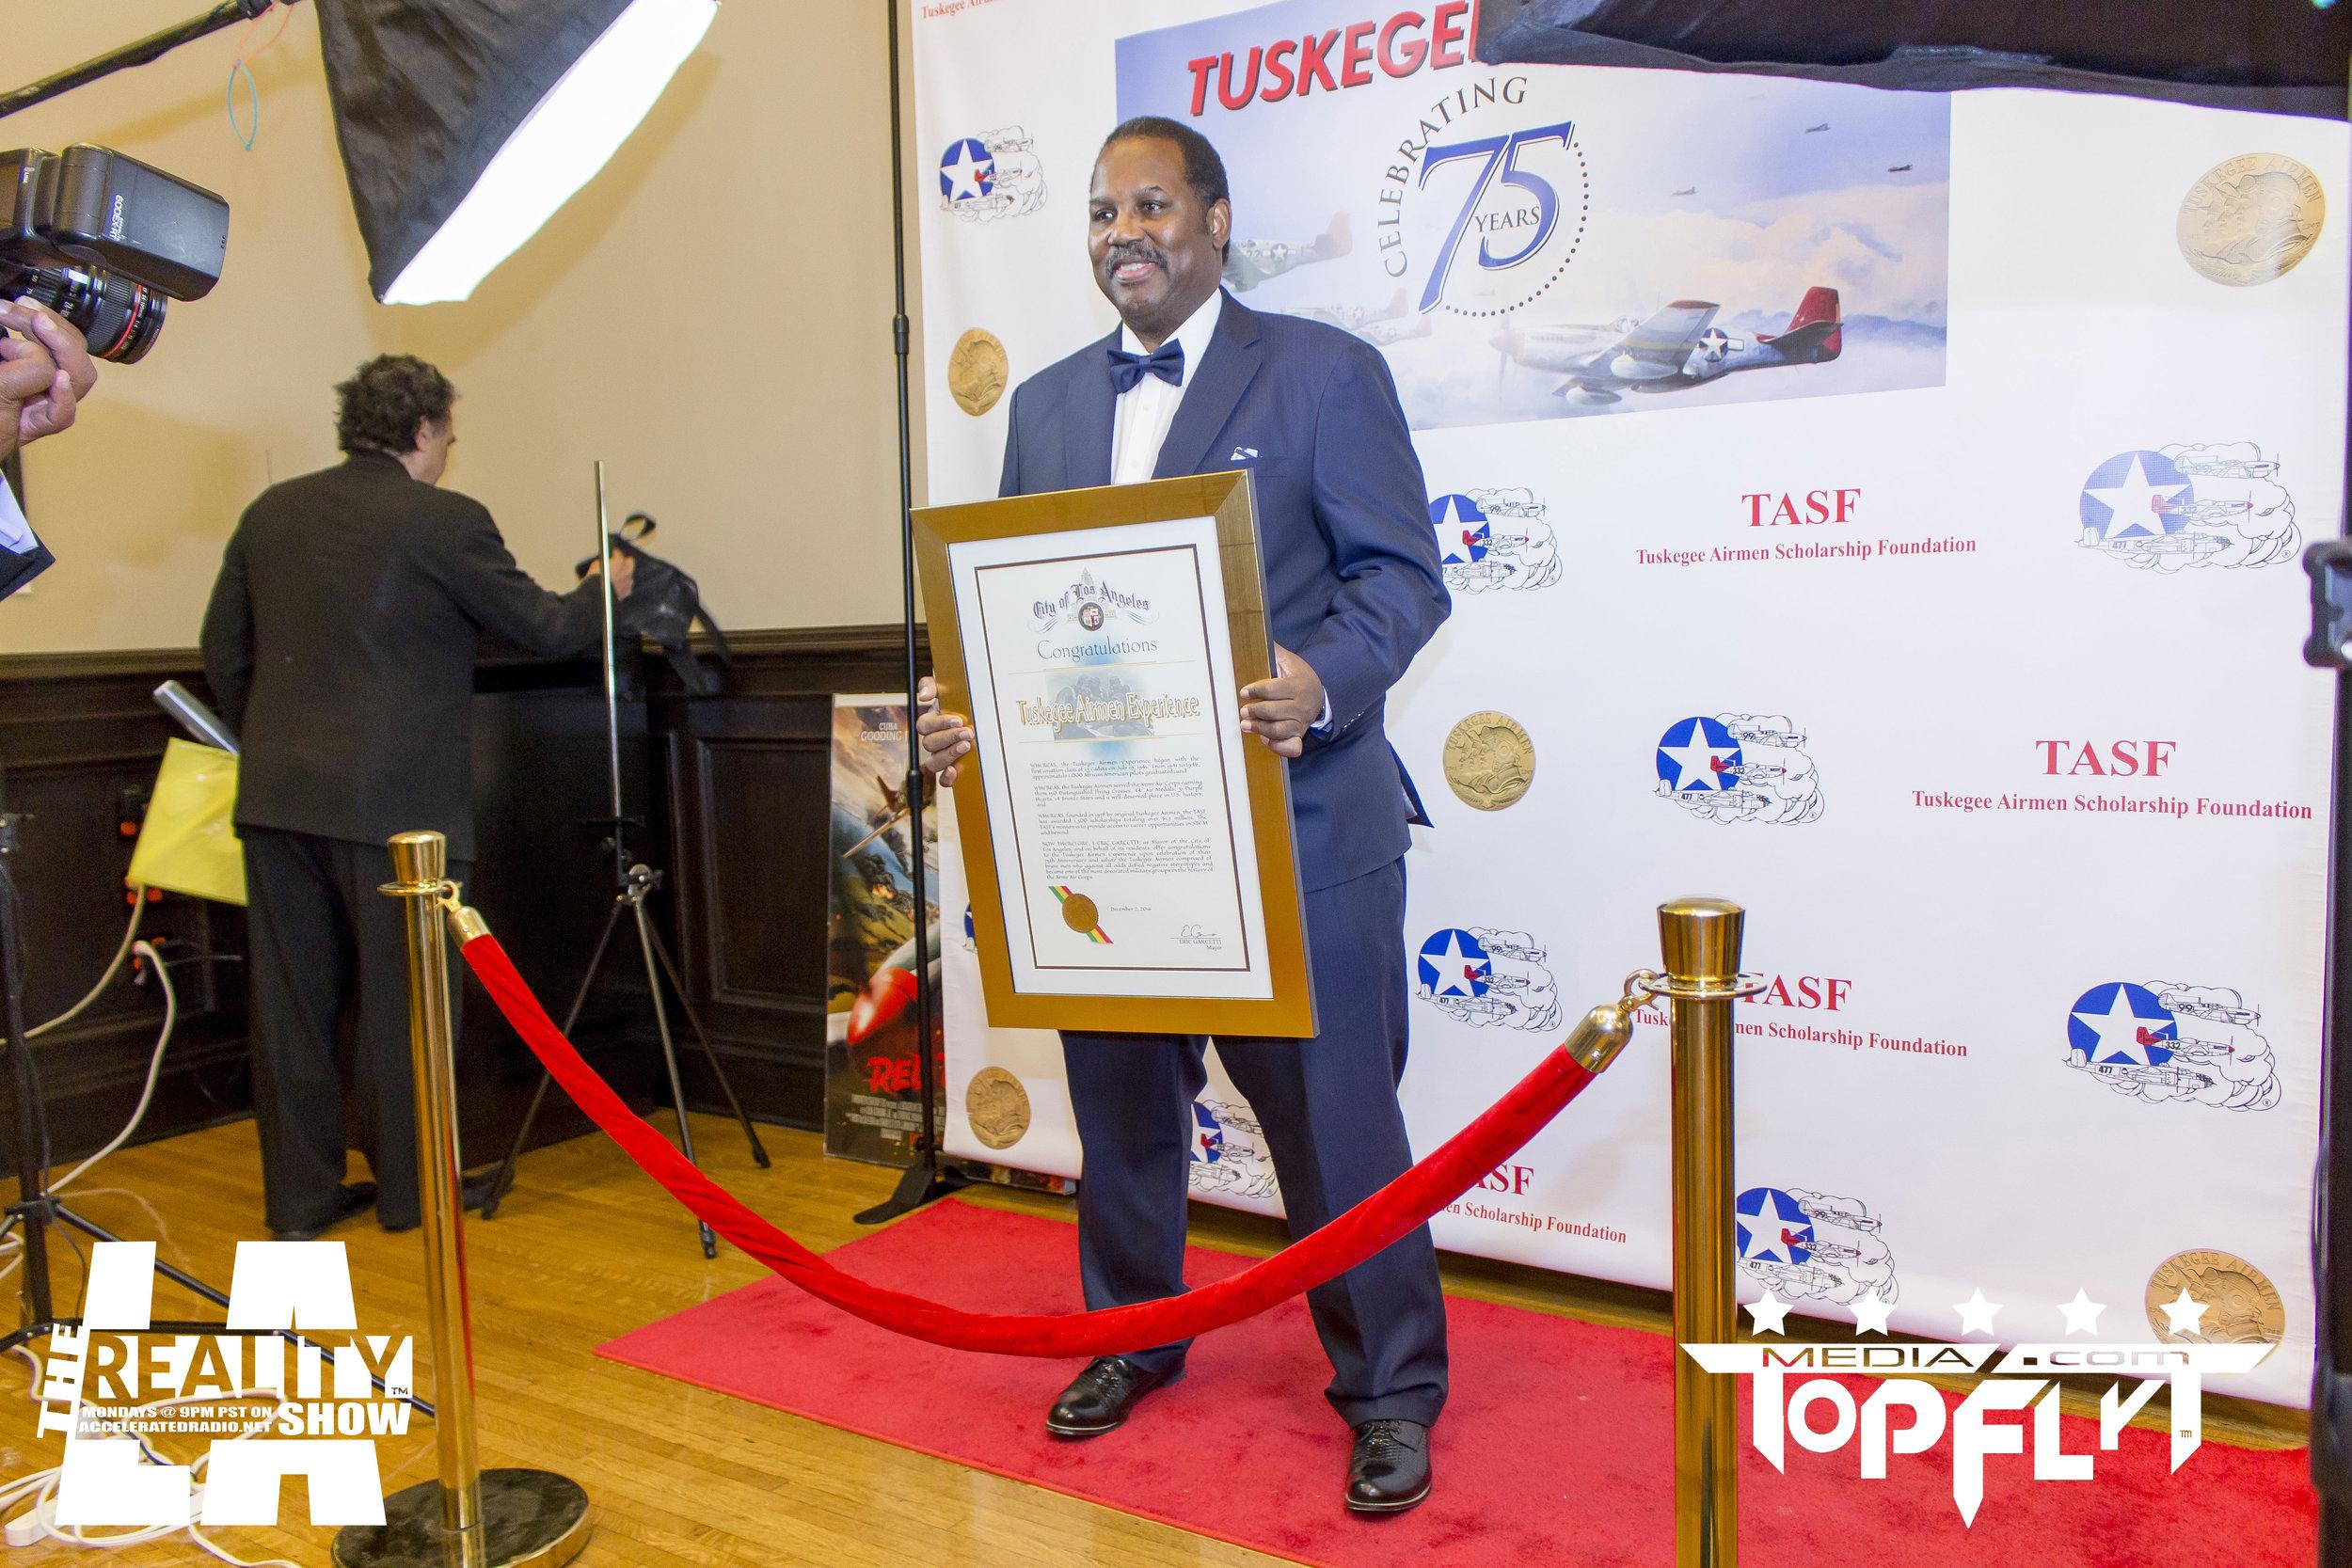 The Reality Show LA - Tuskegee Airmen 75th Anniversary VIP Reception_113.jpg